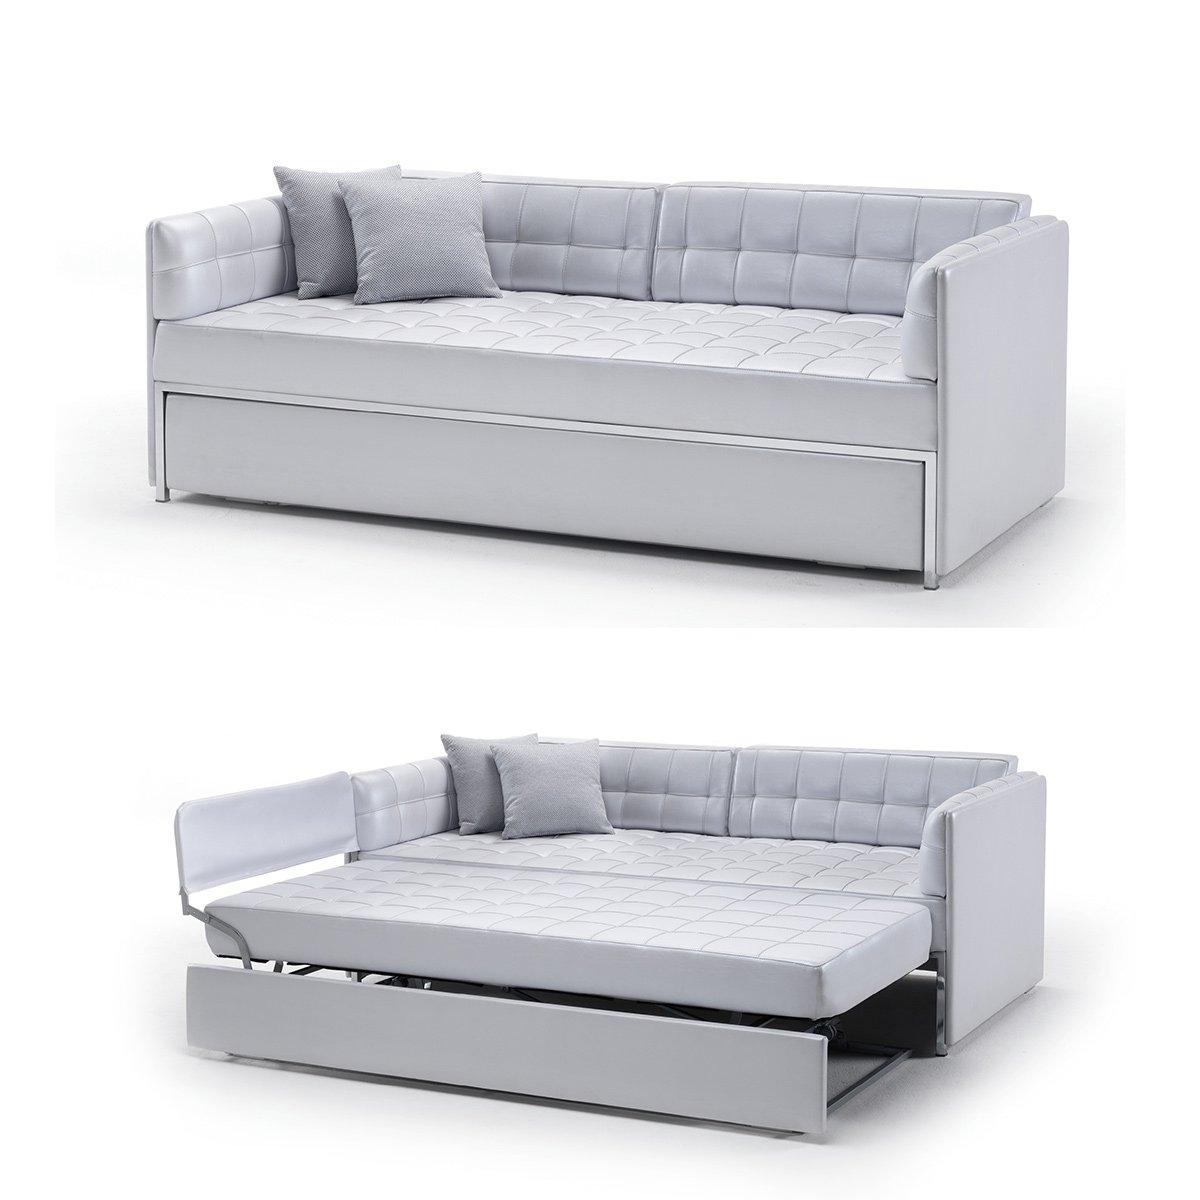 lit gigogne design meubles et atmosphere